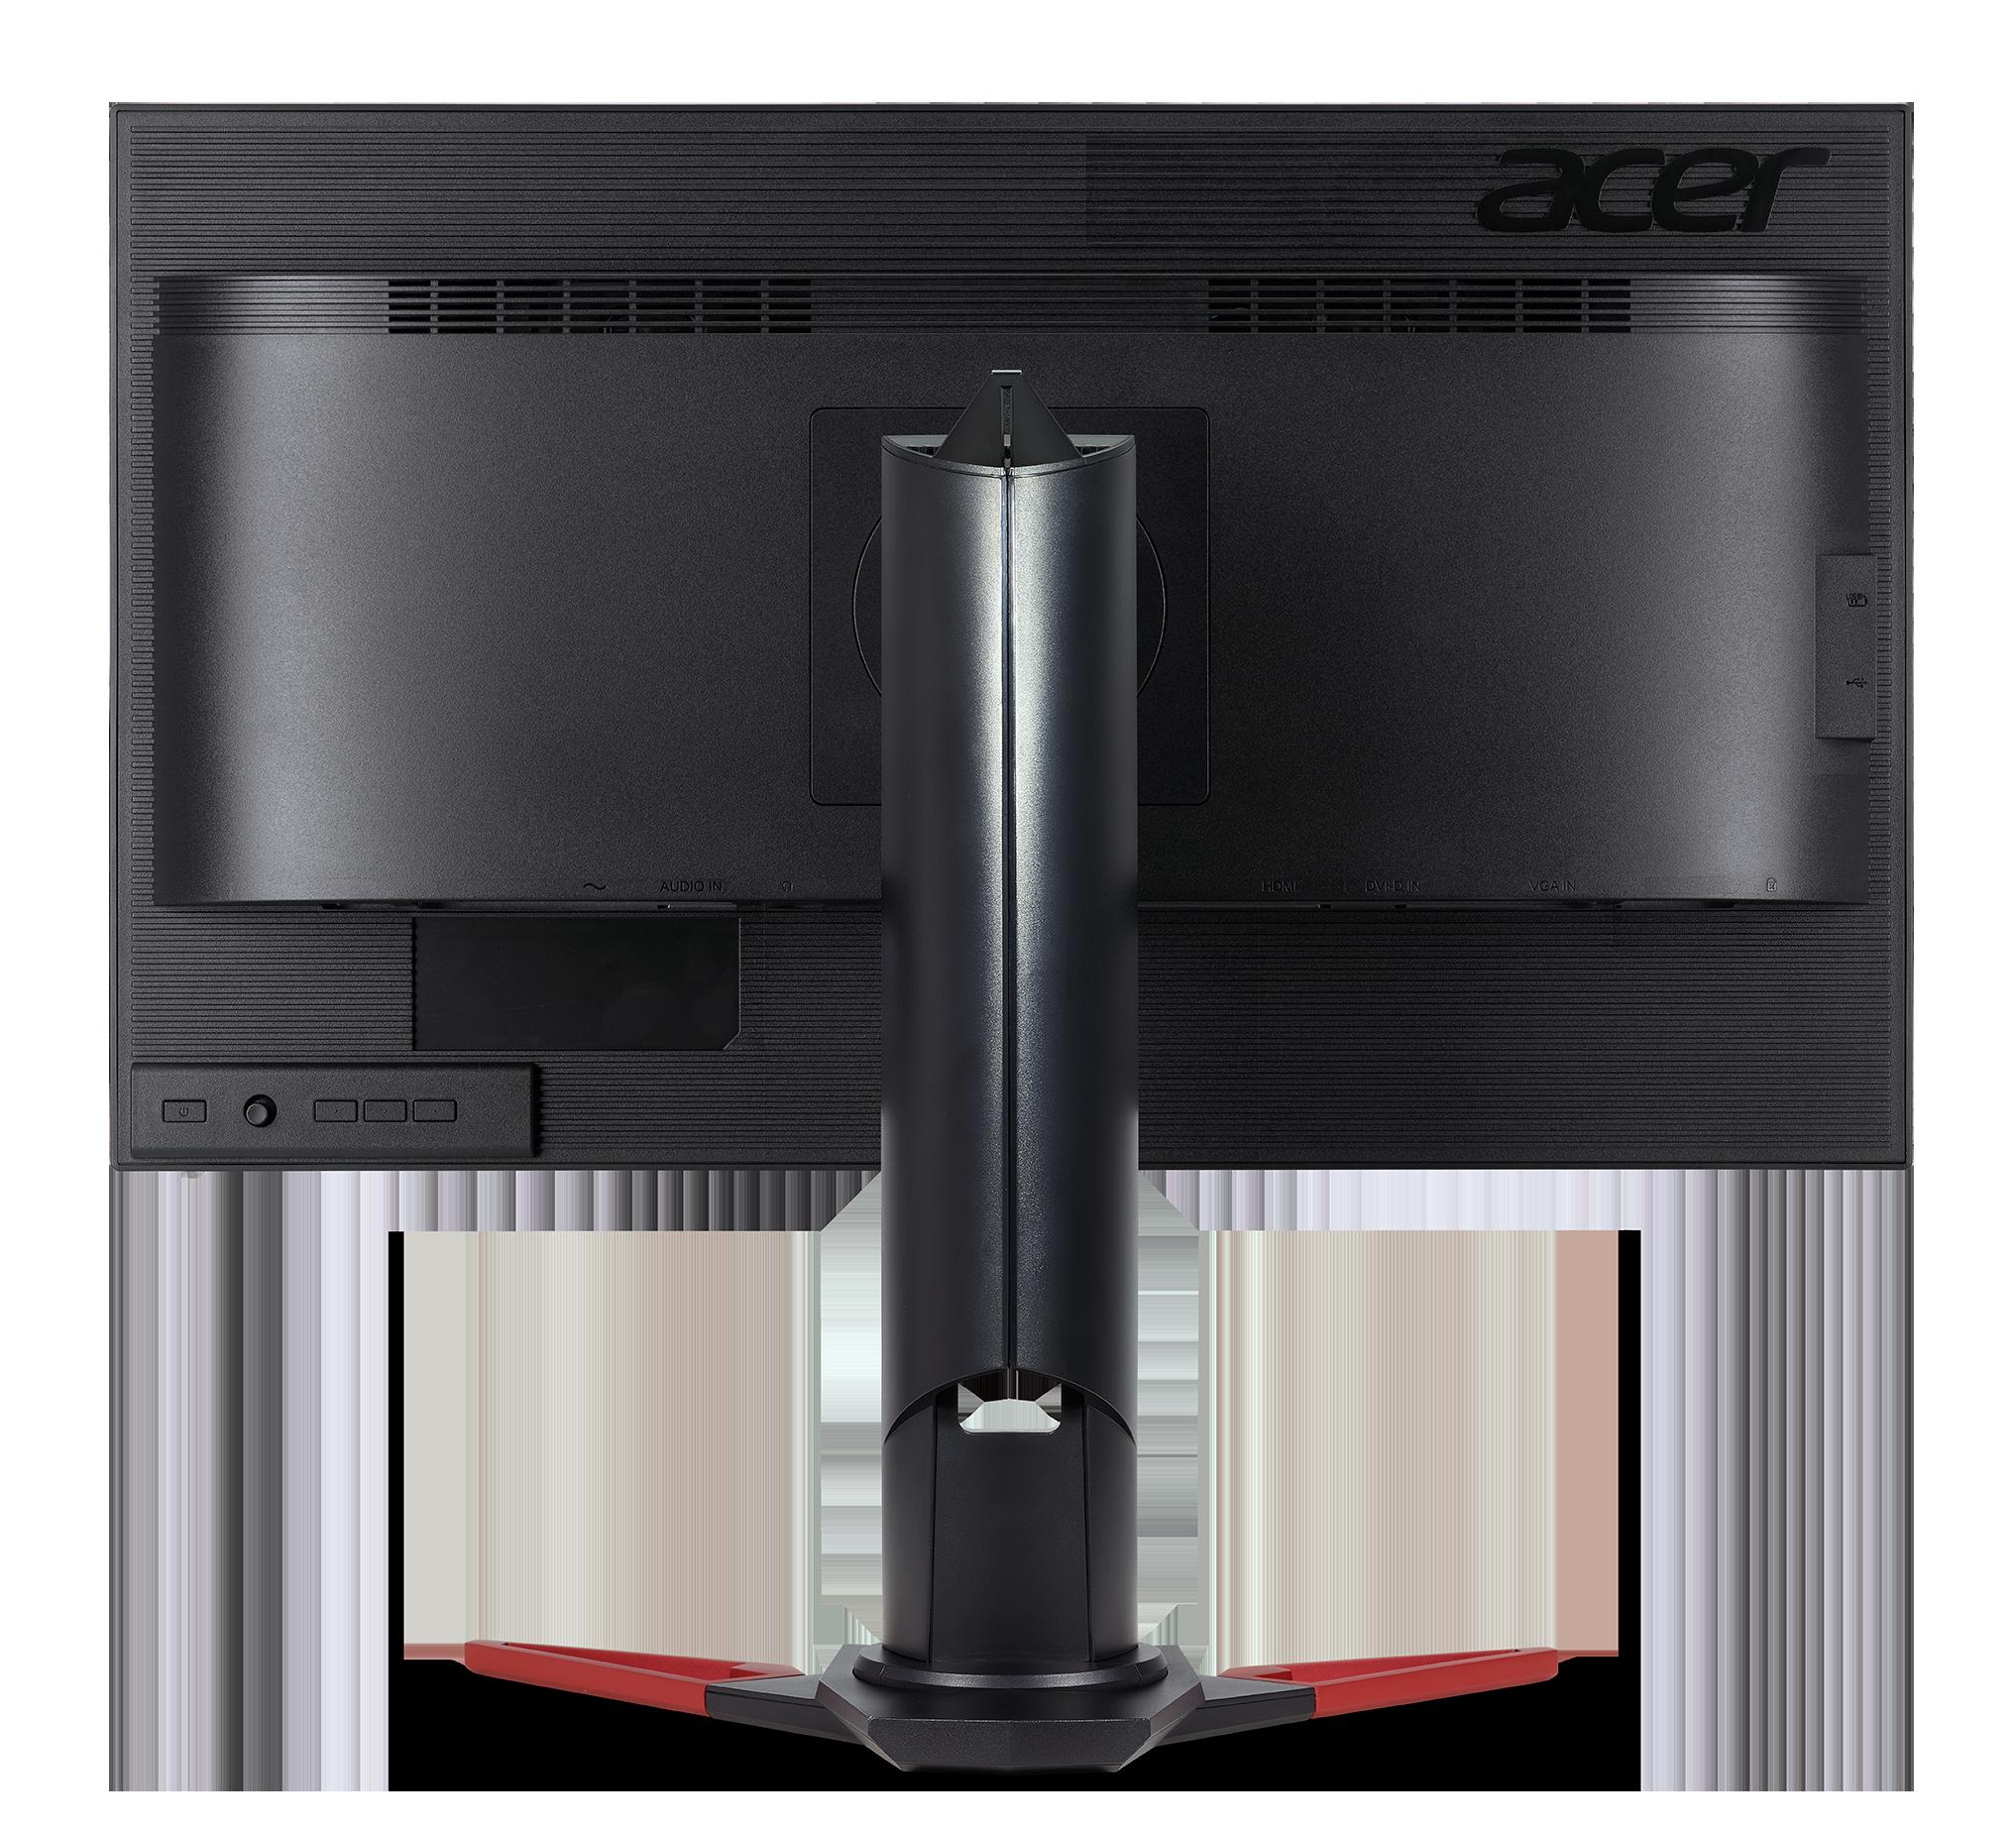 "( TN 27"" 144Hz ) Acer Predator XB271HA G-Sync 1ms"